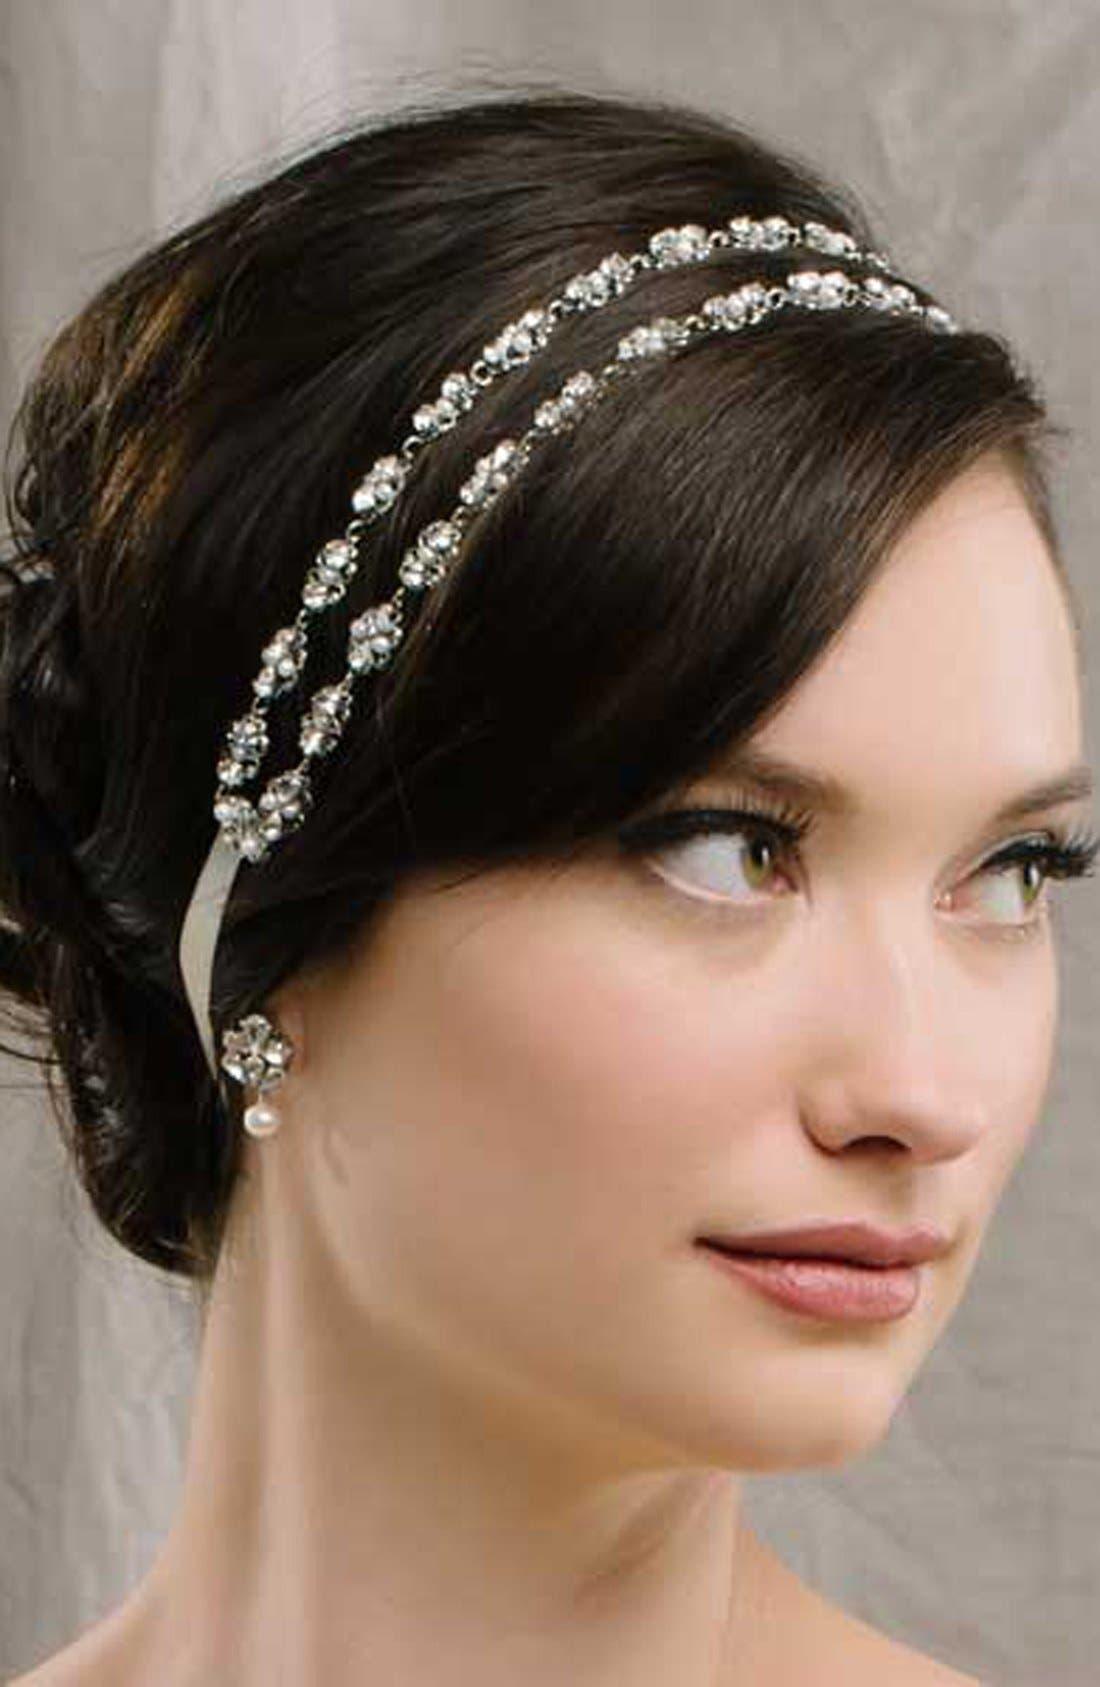 'Rose' Two Strand Filigree Hair Ribbon,                             Main thumbnail 1, color,                             Pale Ivory